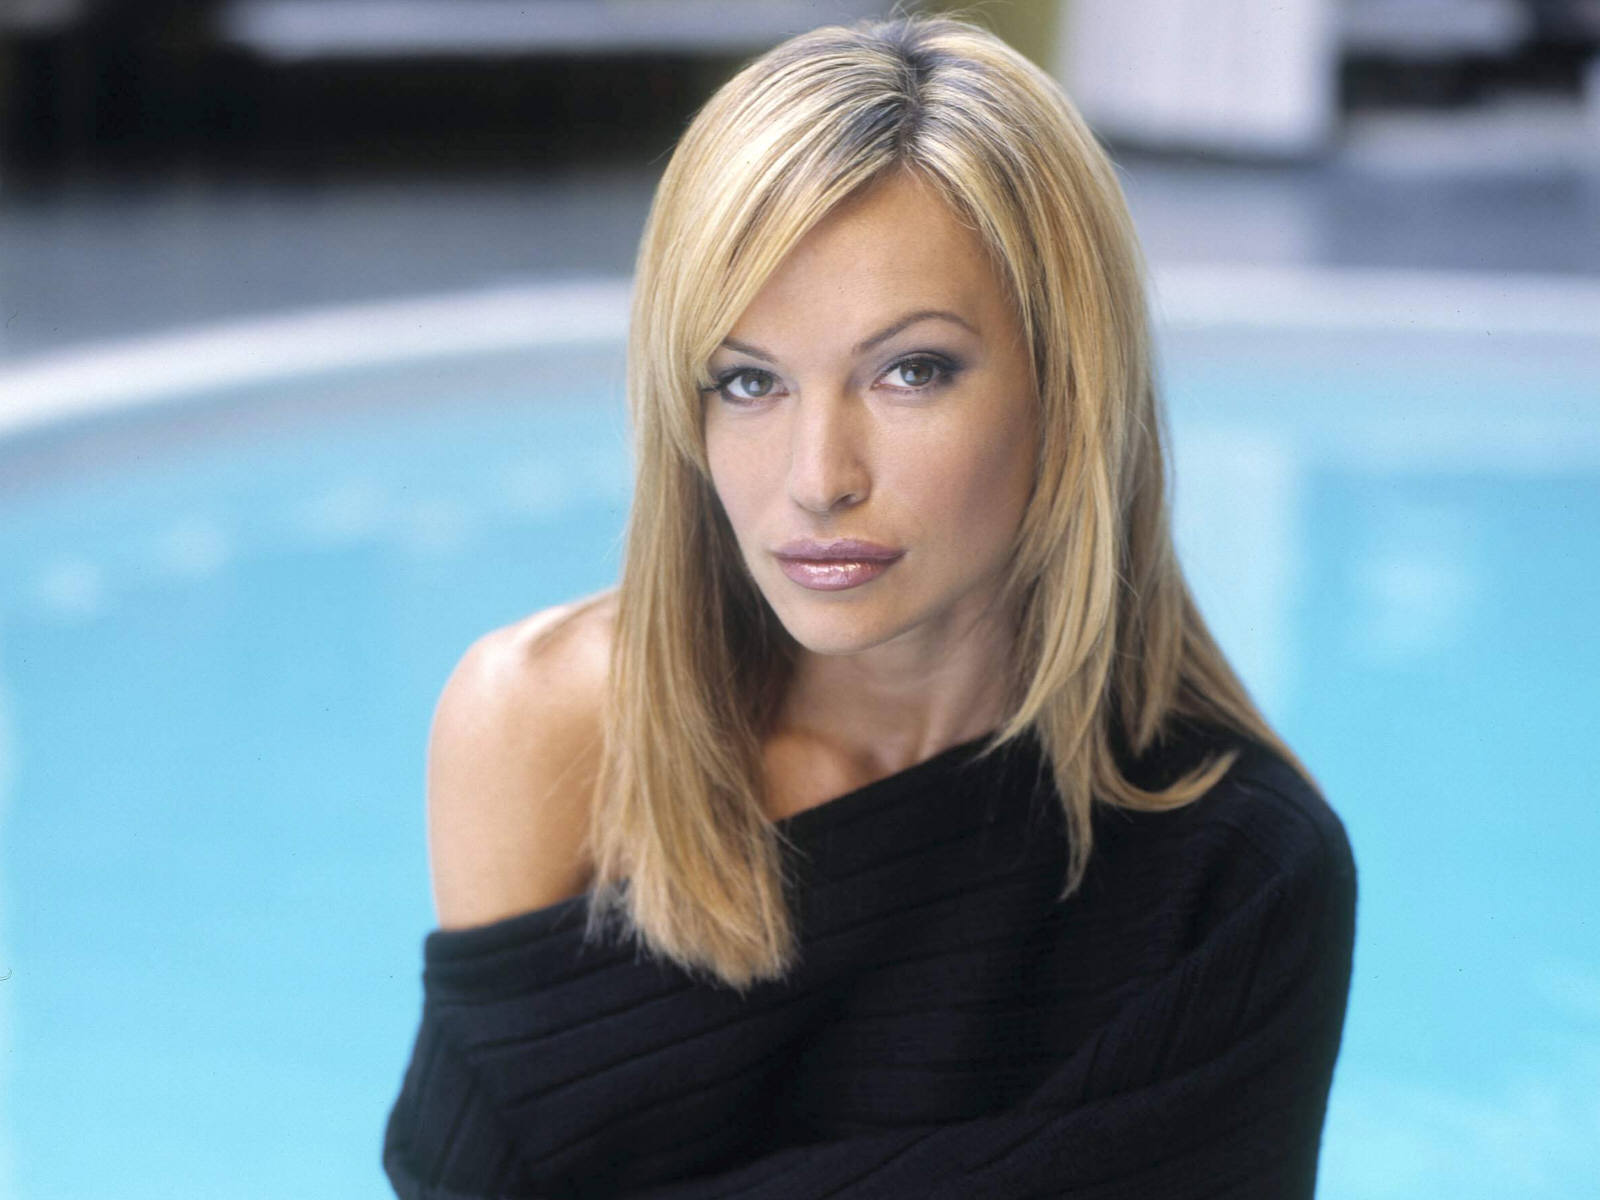 Poze rezolutie mare Jolene Blalock - Actor - Poza 72 din